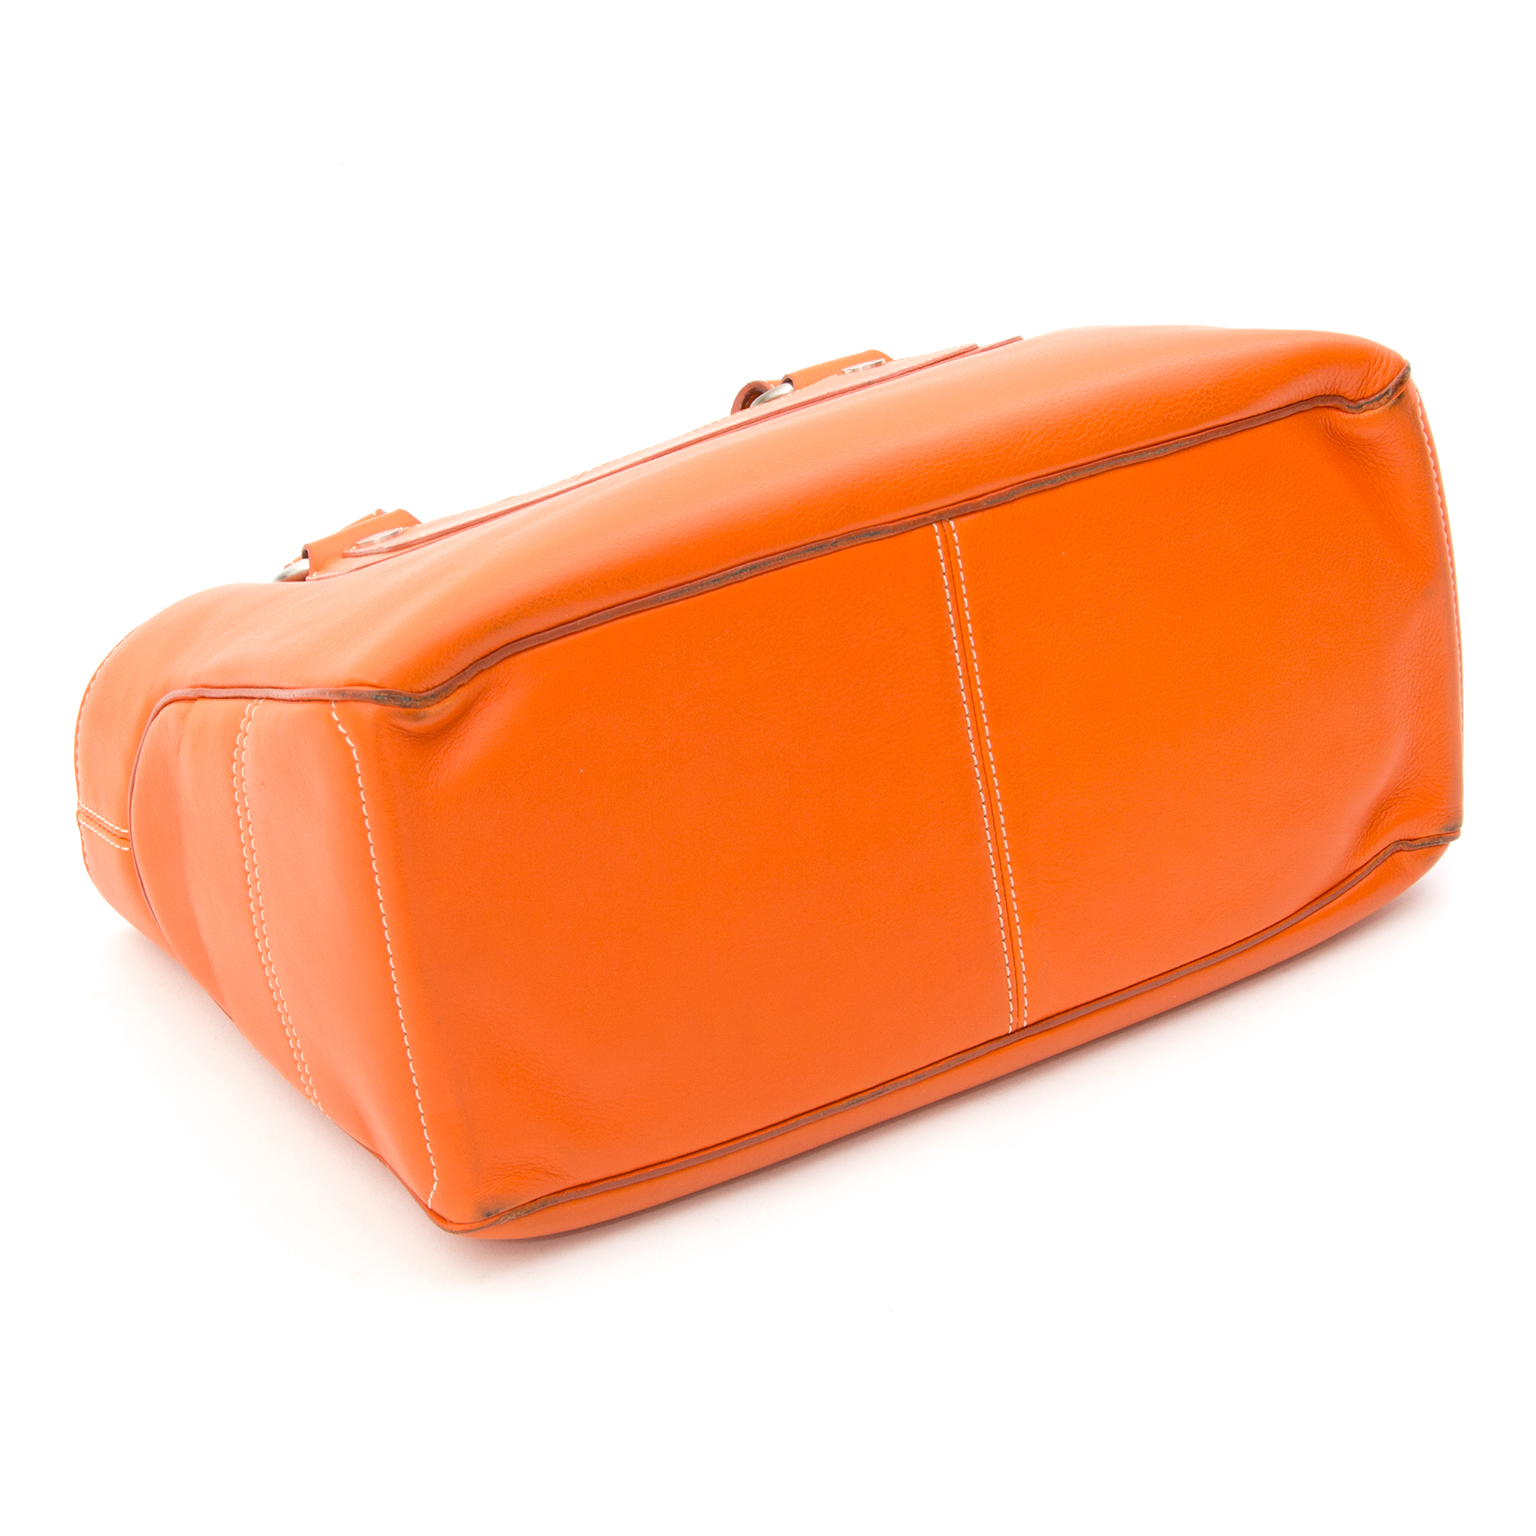 celine trio bag buy online - celine orange leather handbag boogie